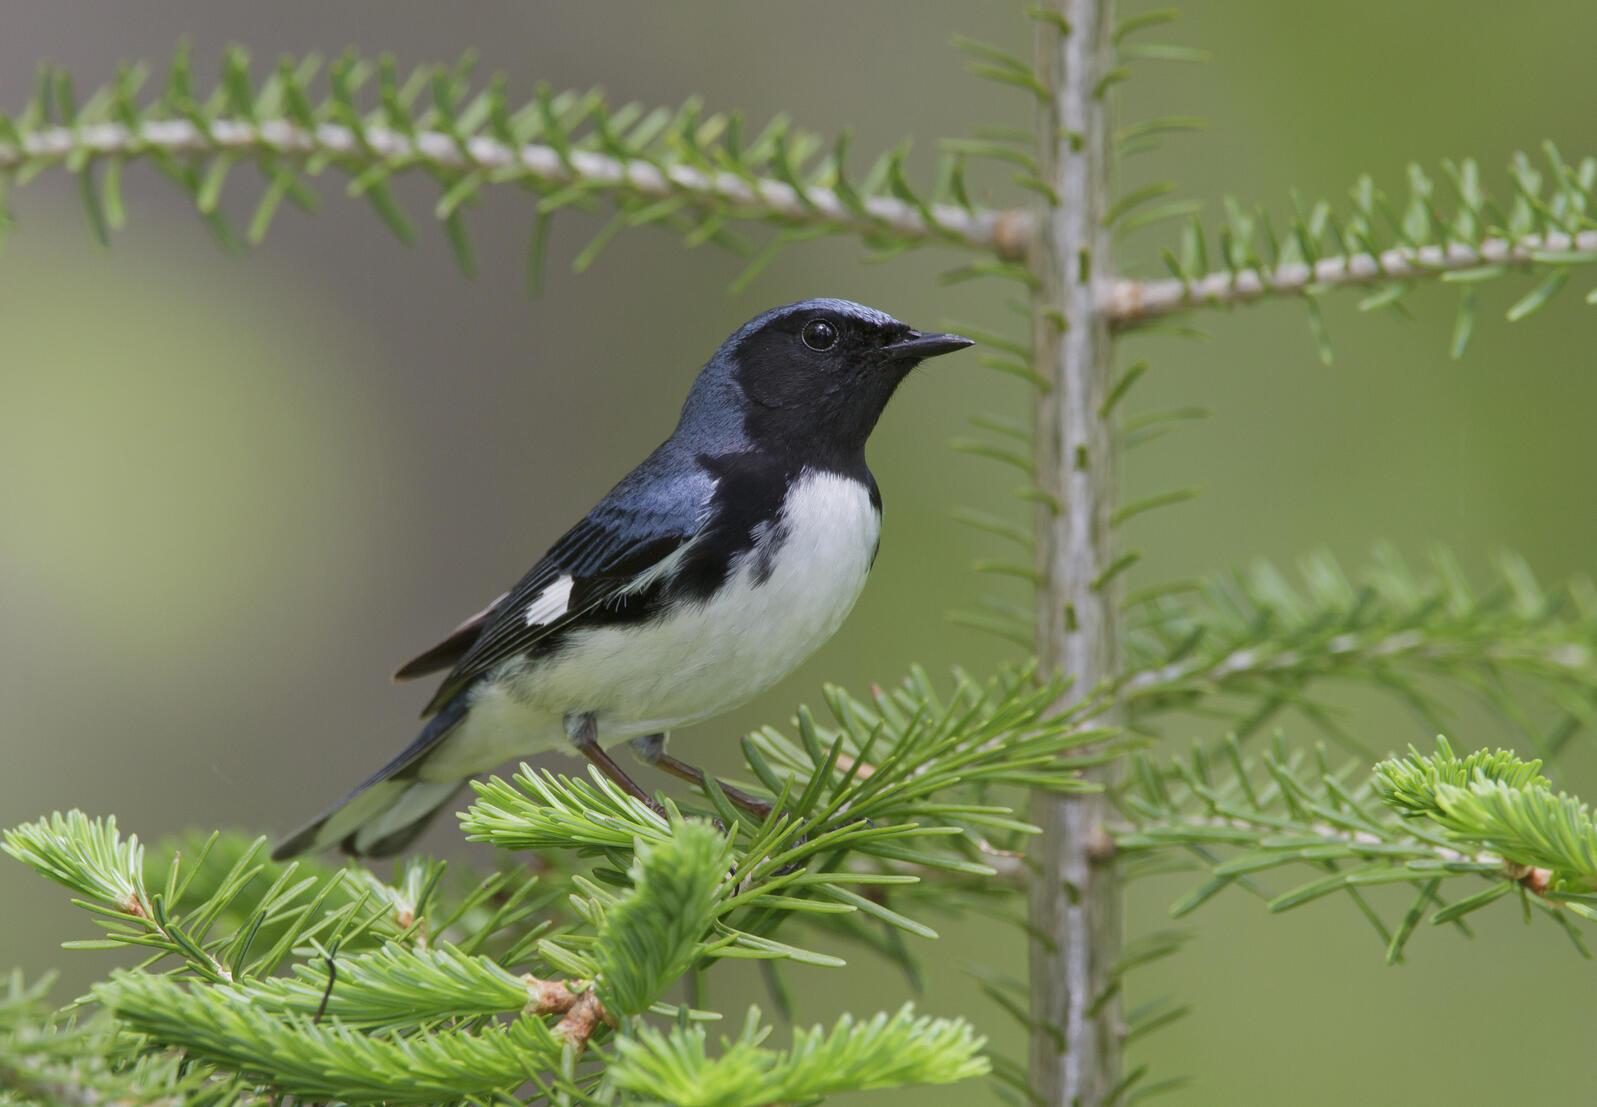 Black-throated blue warbler Robert Royse